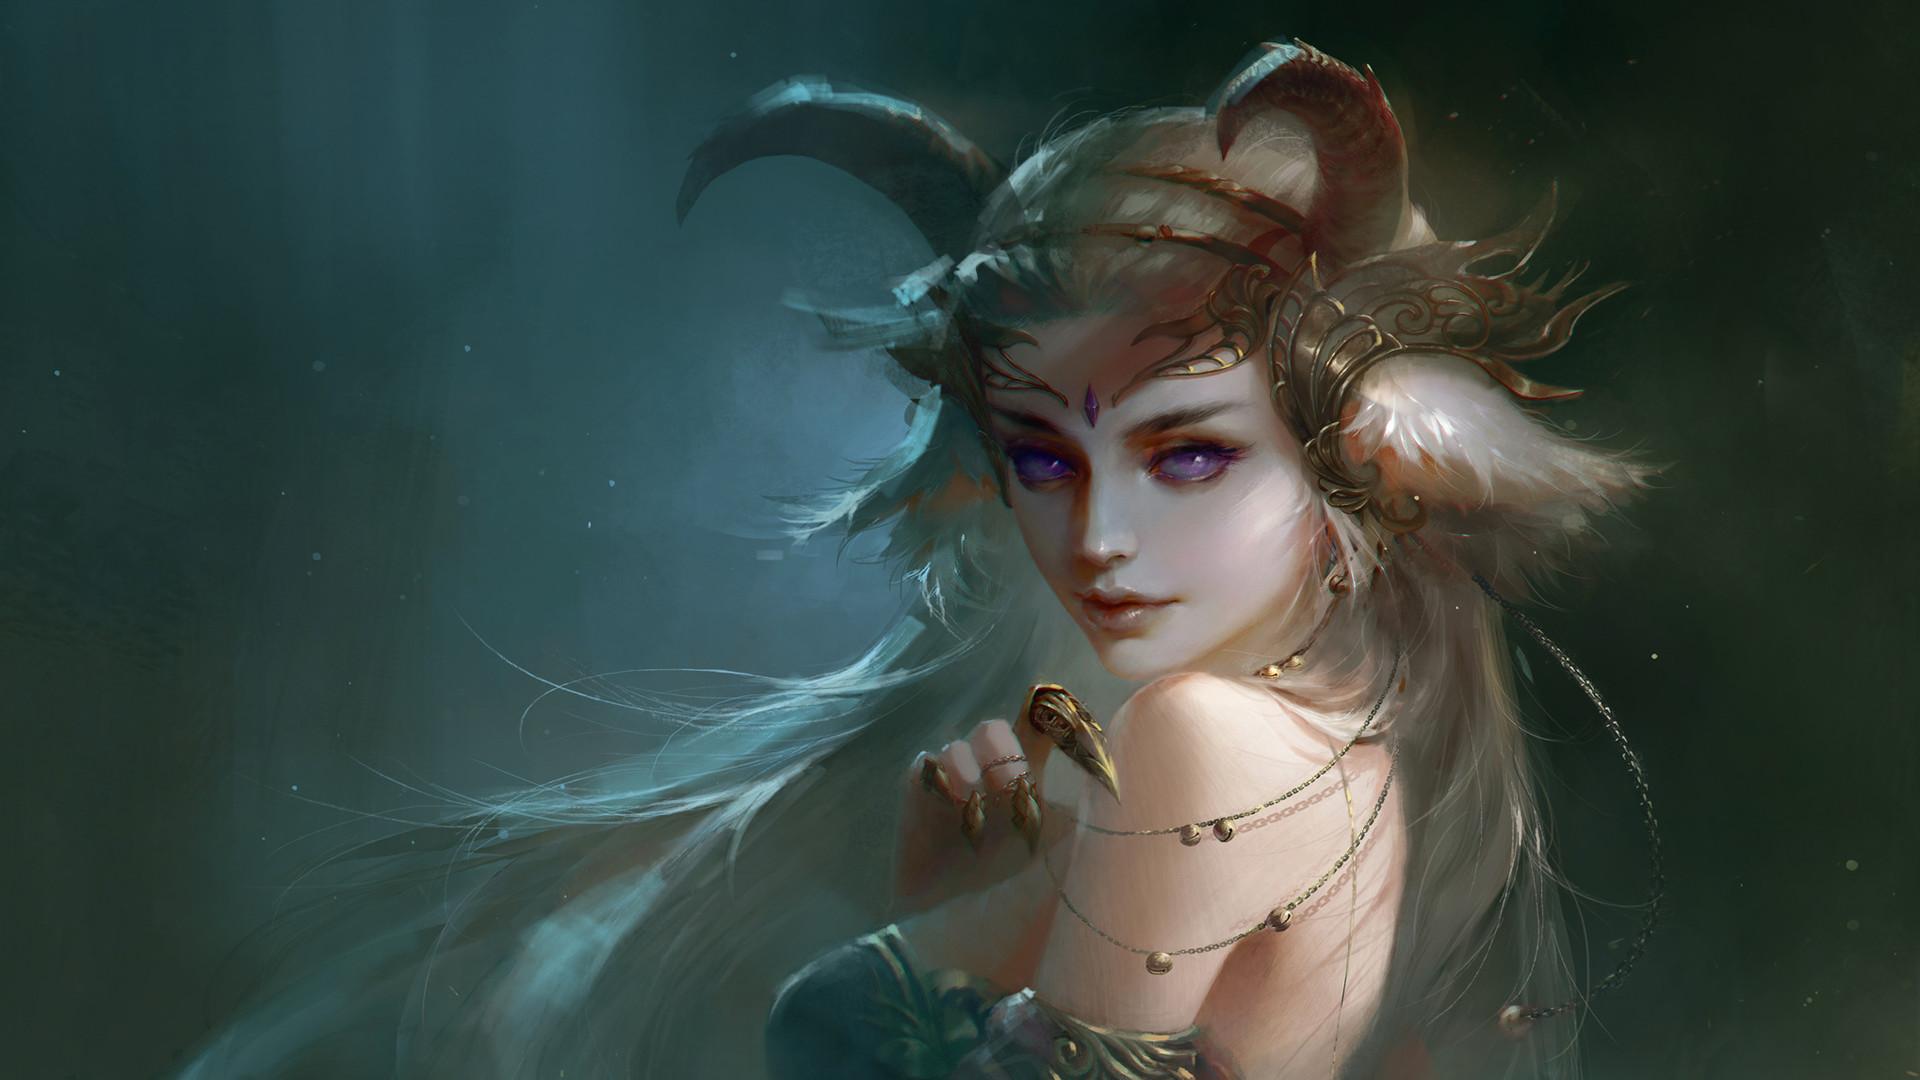 Res: 1920x1080, Demon Beautiful Girl